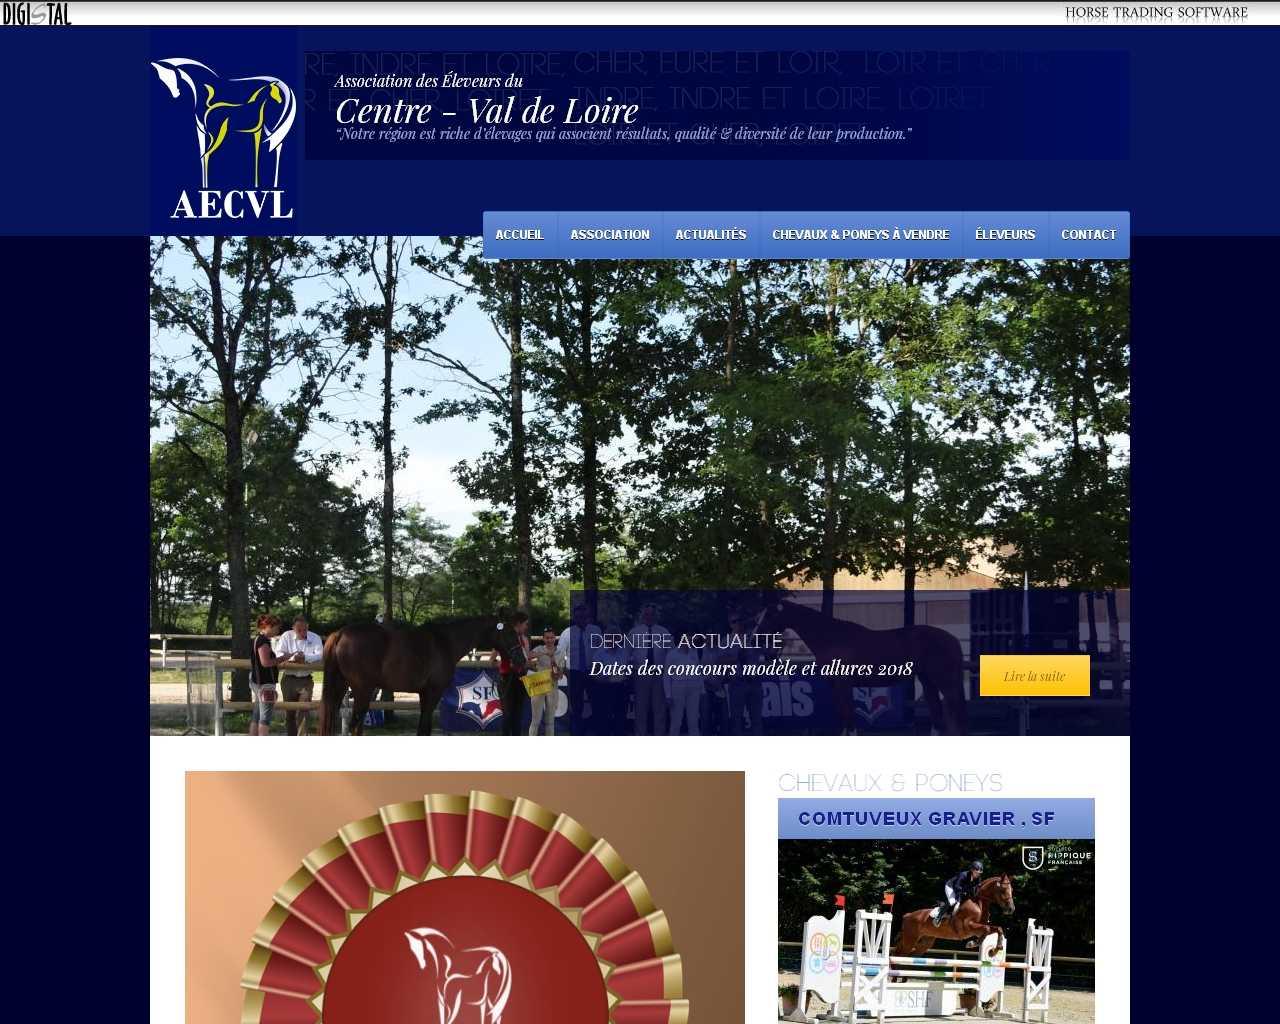 AECVL un site Dreamclic